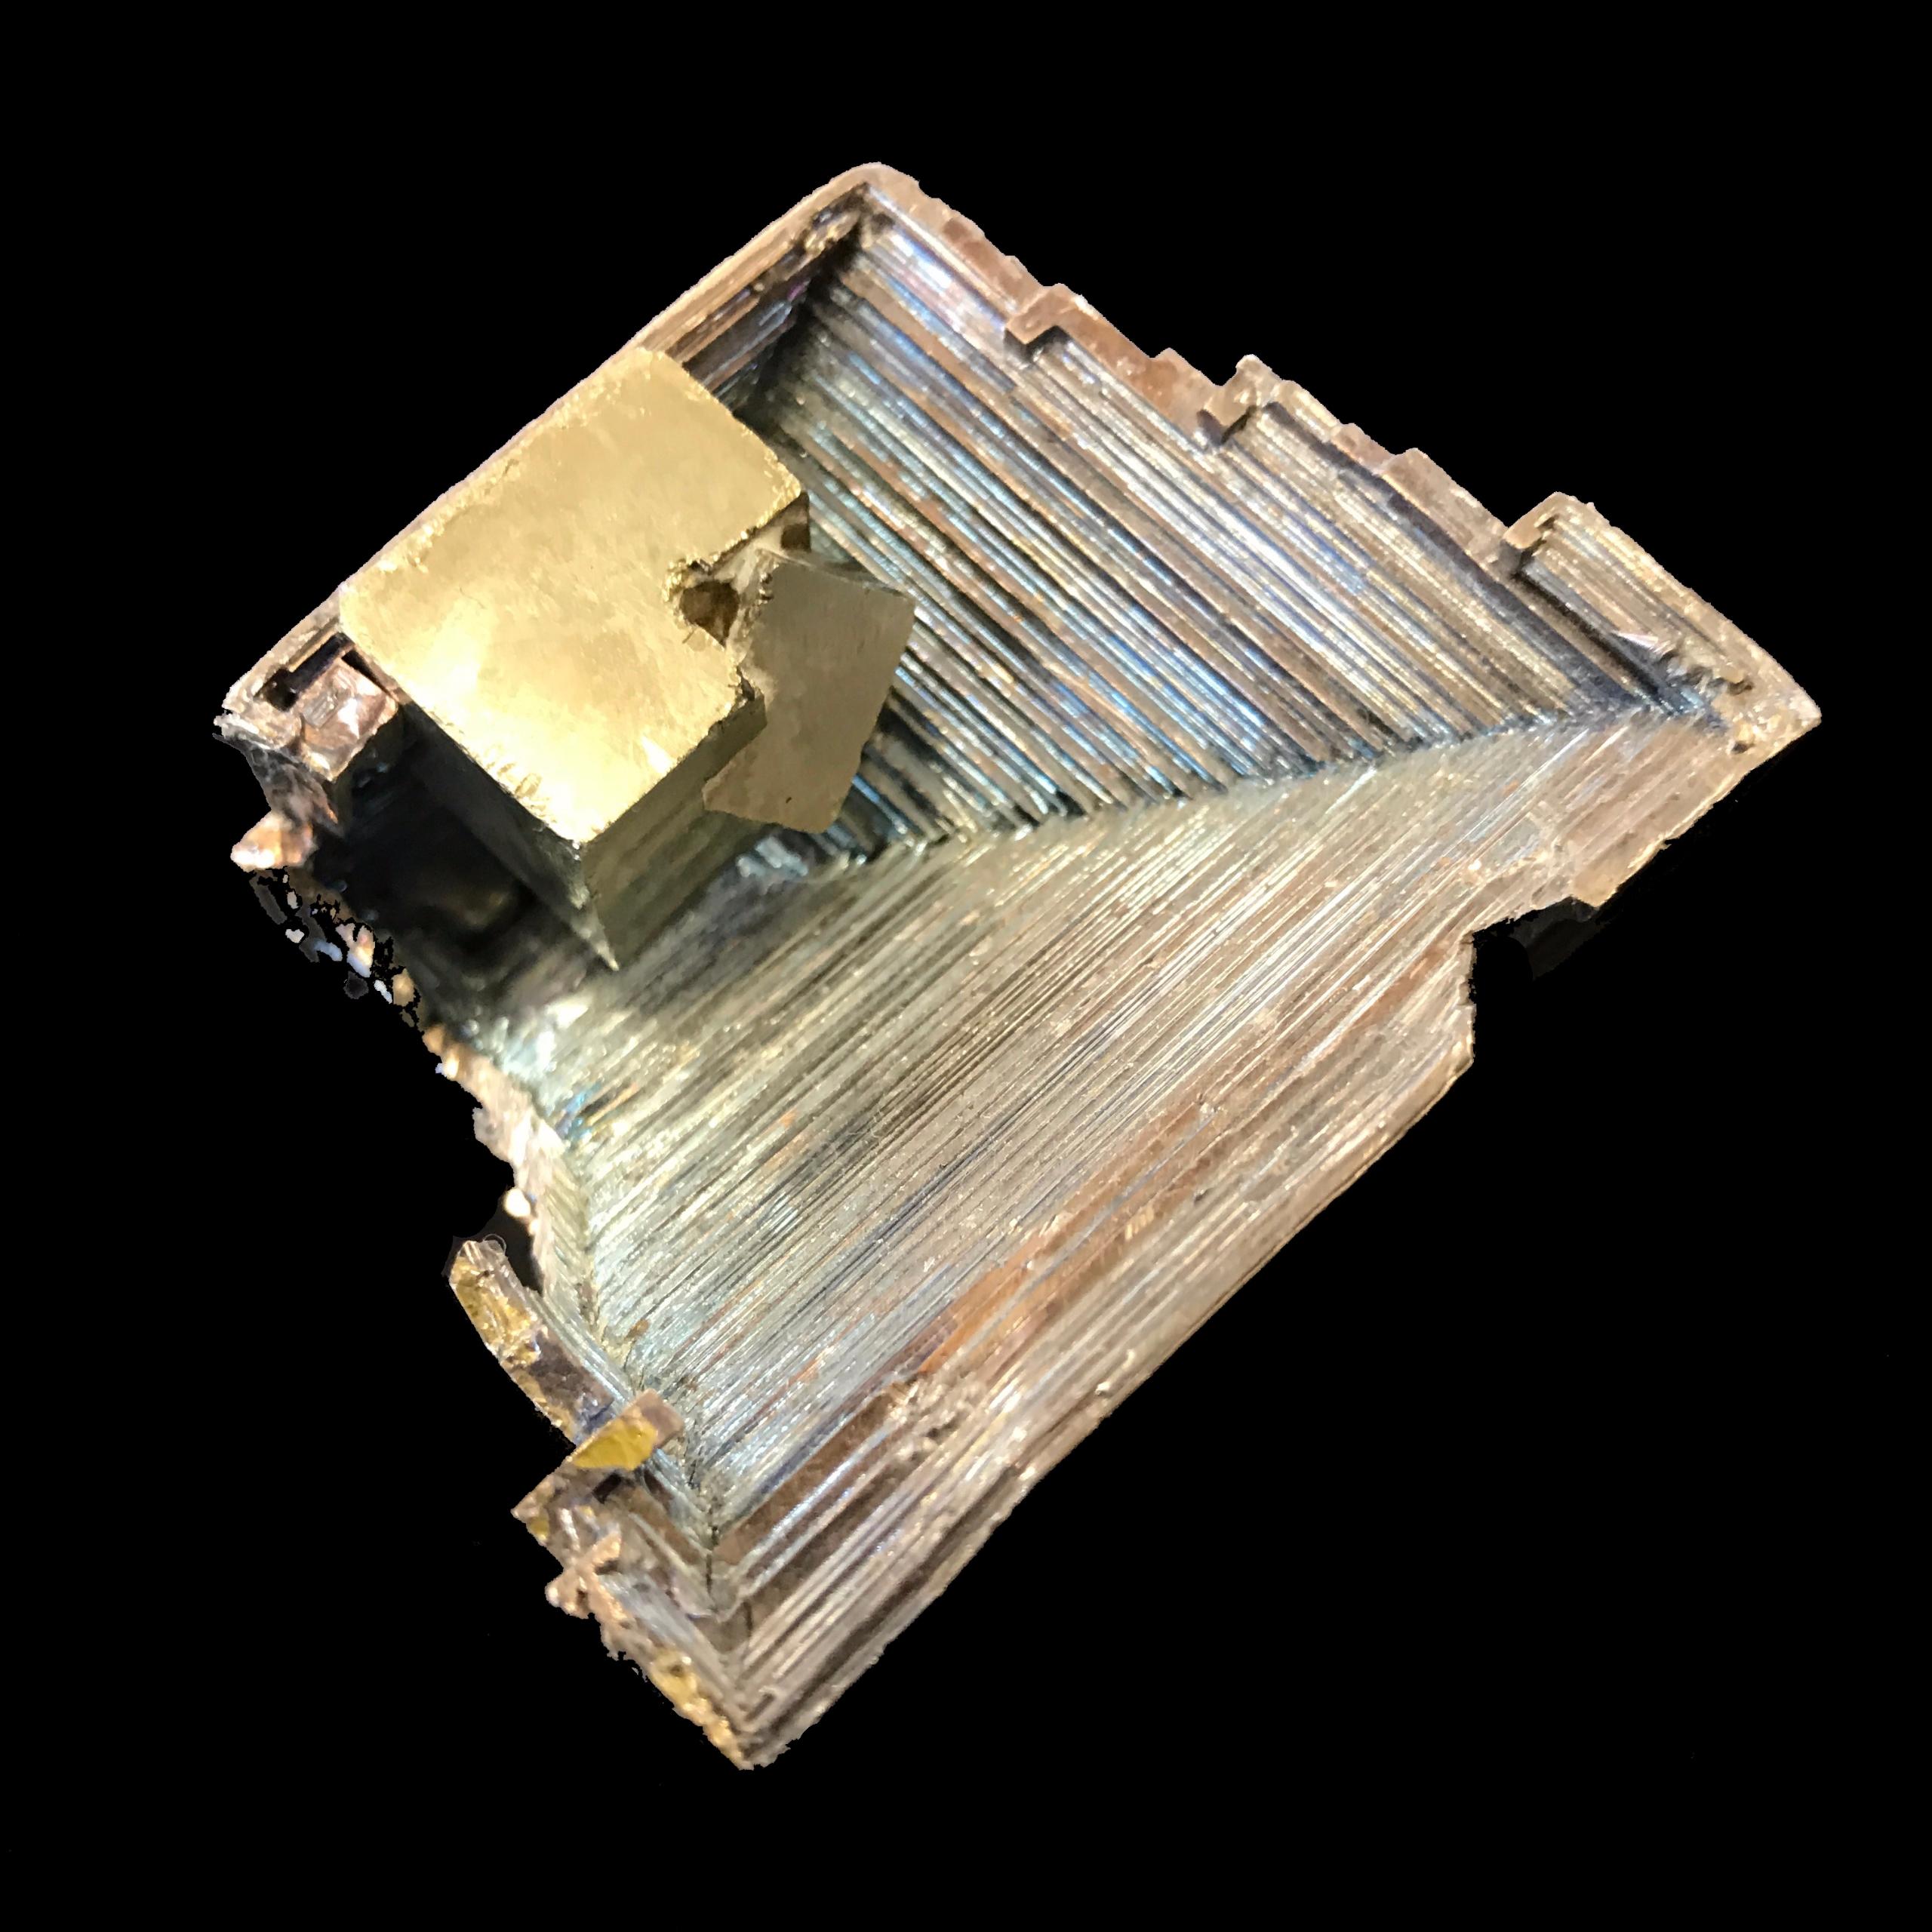 pyrite meets bismuth - charles_3_1416 | ello